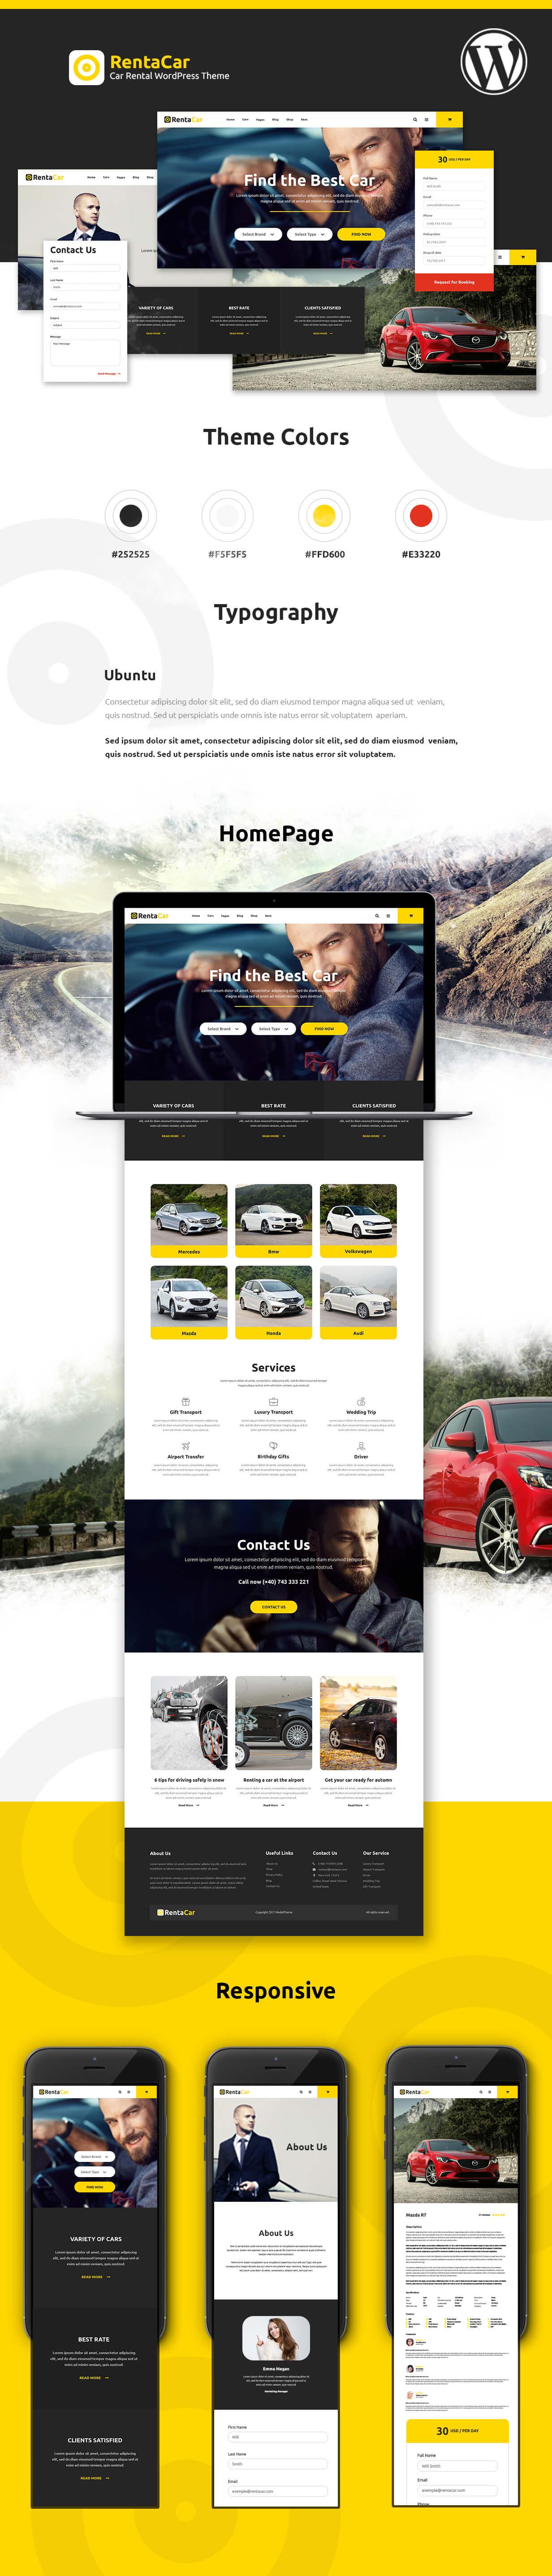 Car Rental Websites >> Rentacar Car Rental Listing Wordpress Theme